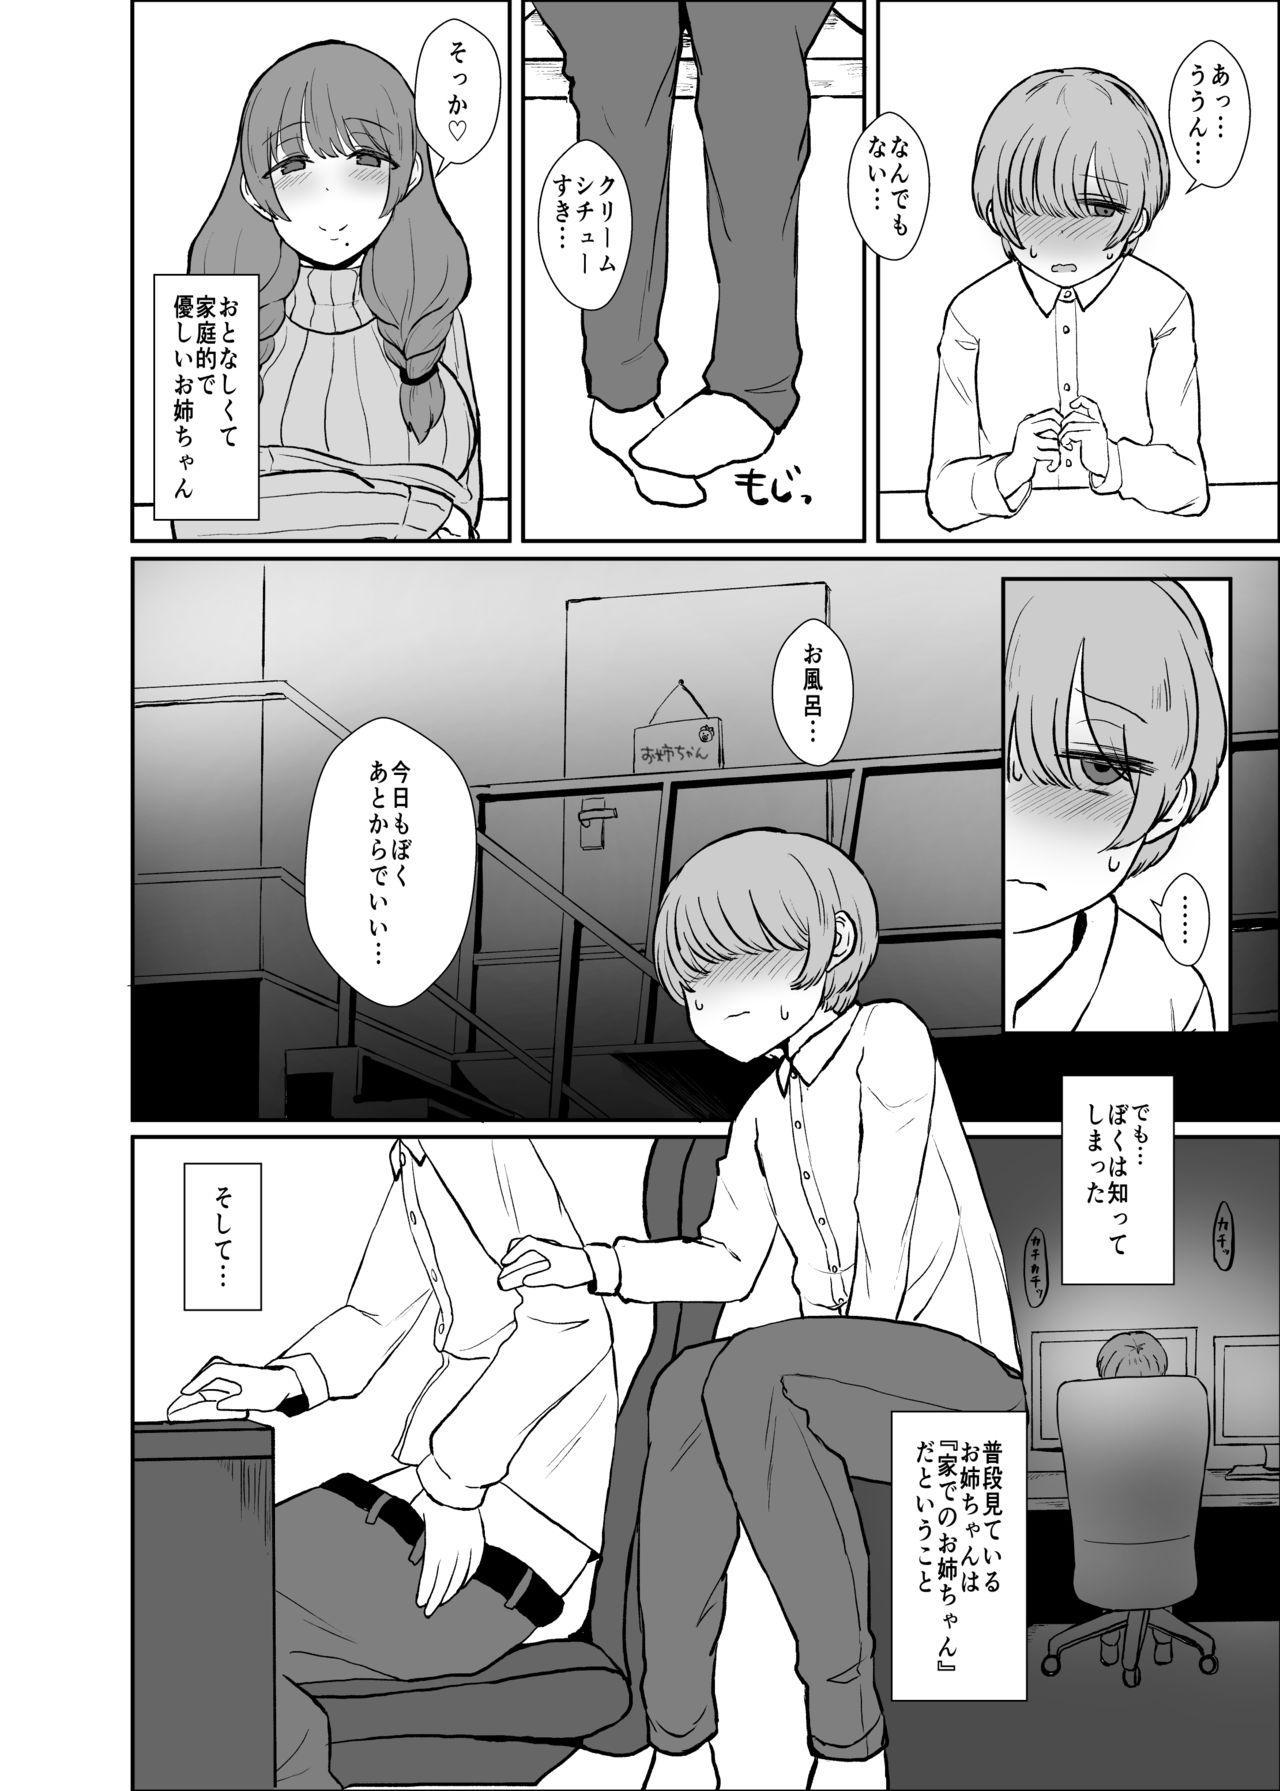 Onee-chan no Heya 3